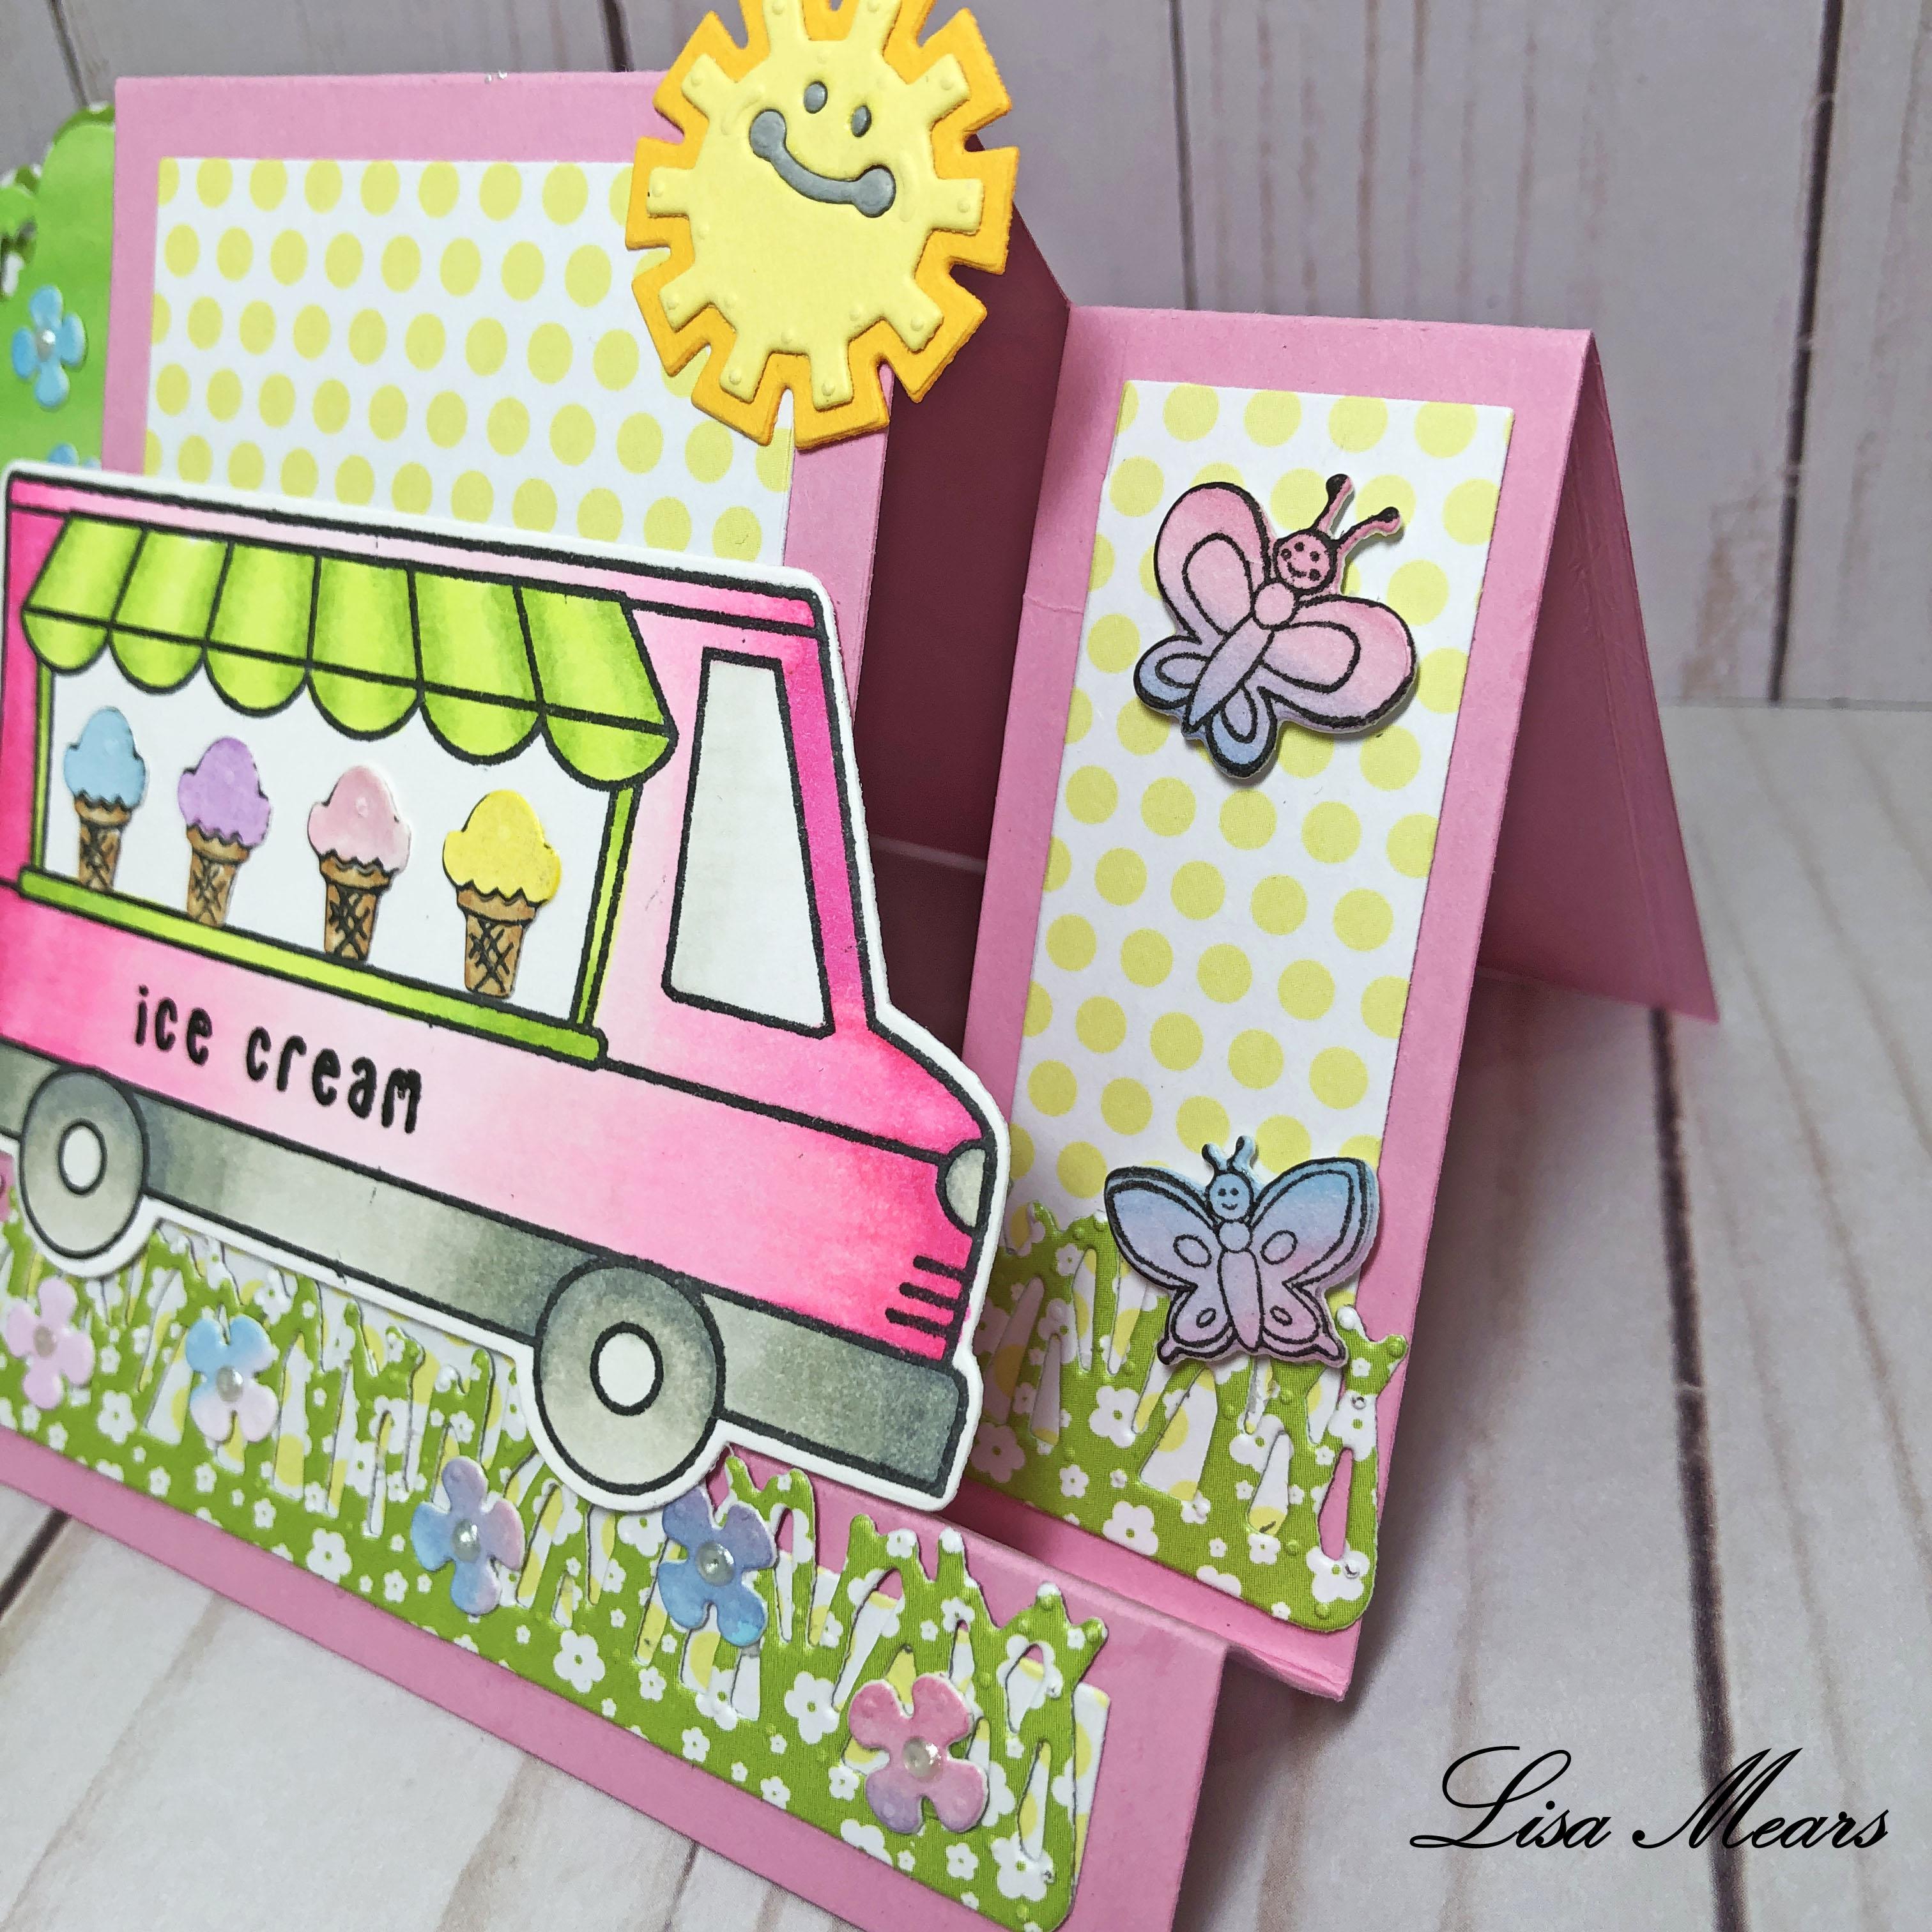 Ice Cream Truck Card